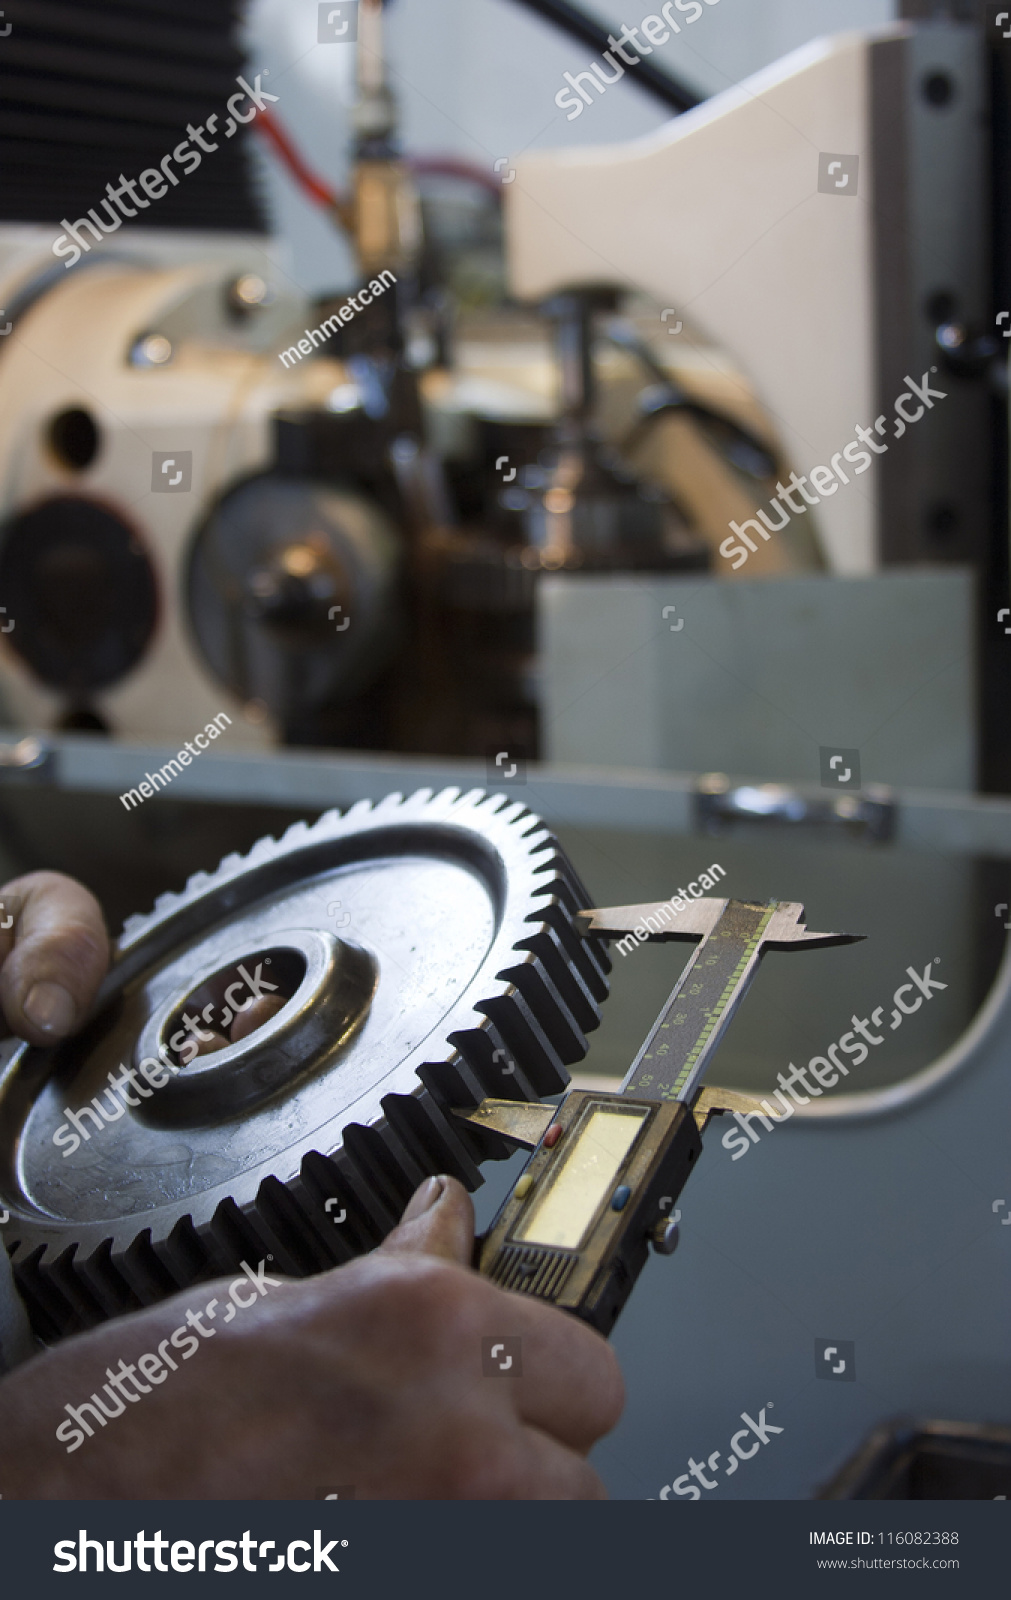 how to get cnc machine work